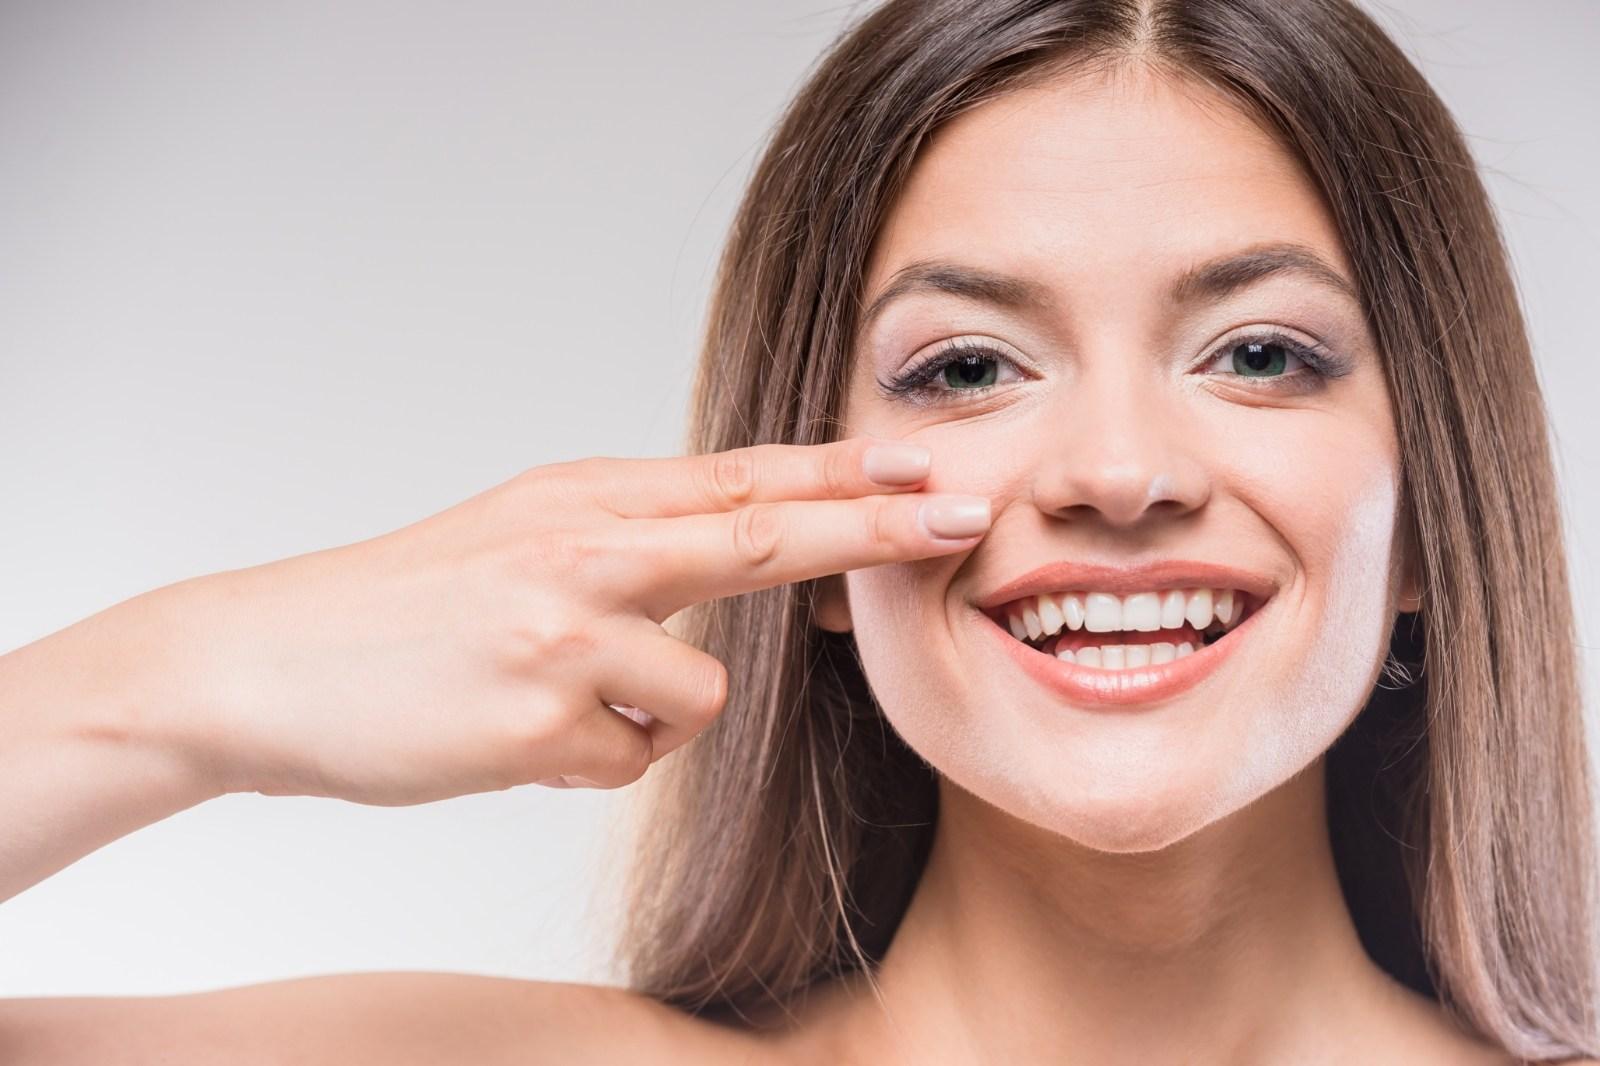 7 Trik Cara Menghilangkan Kemerahan di Wajah